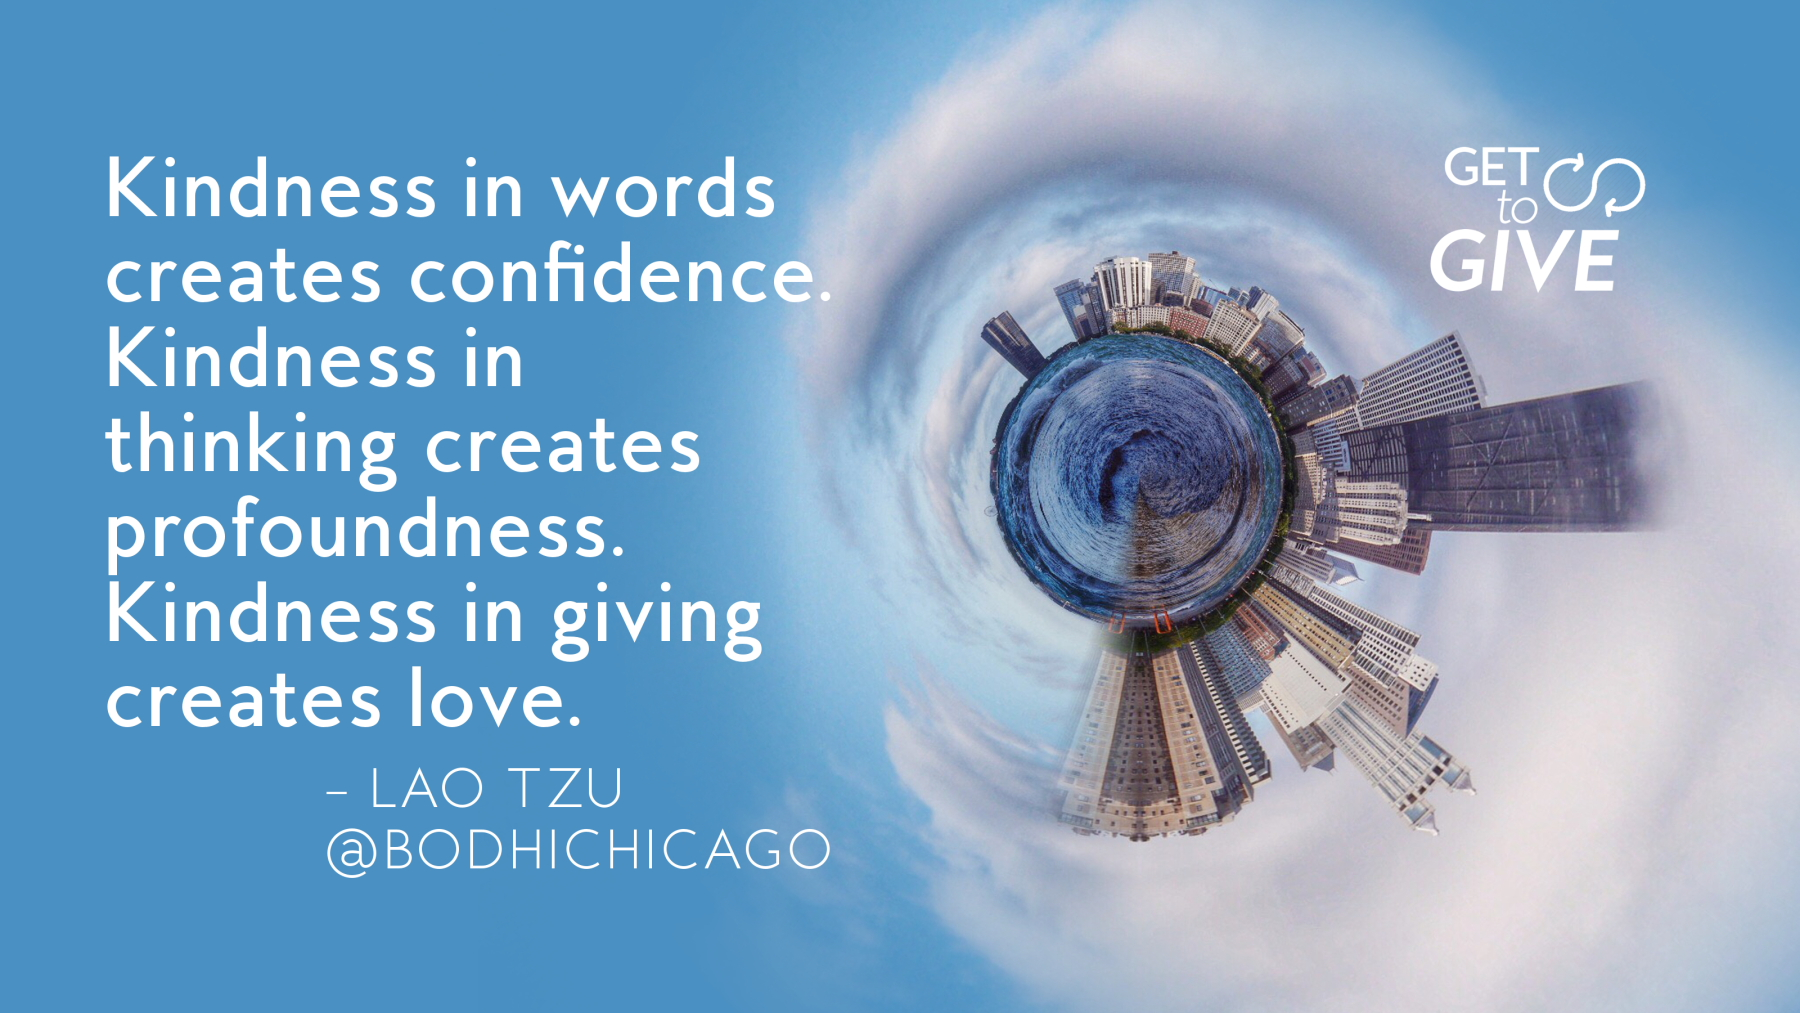 Wednesday Wisdom Quote Lao Tzu On Kindness Bodhi Spiritual Center